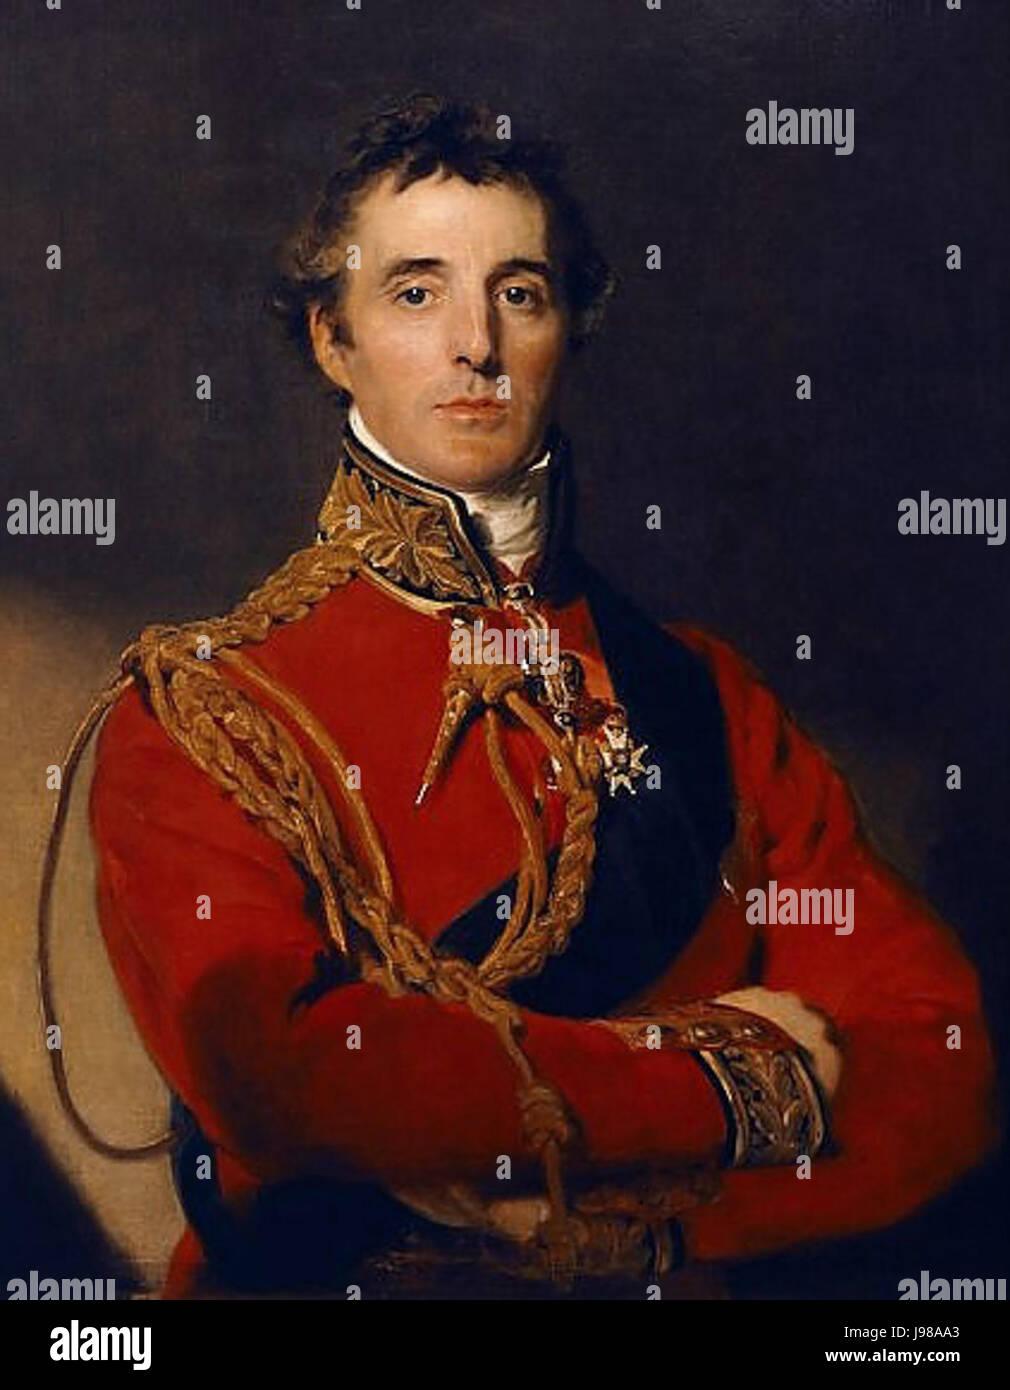 Sir Arthur Wellesley Duke of Wellington - Stock Image